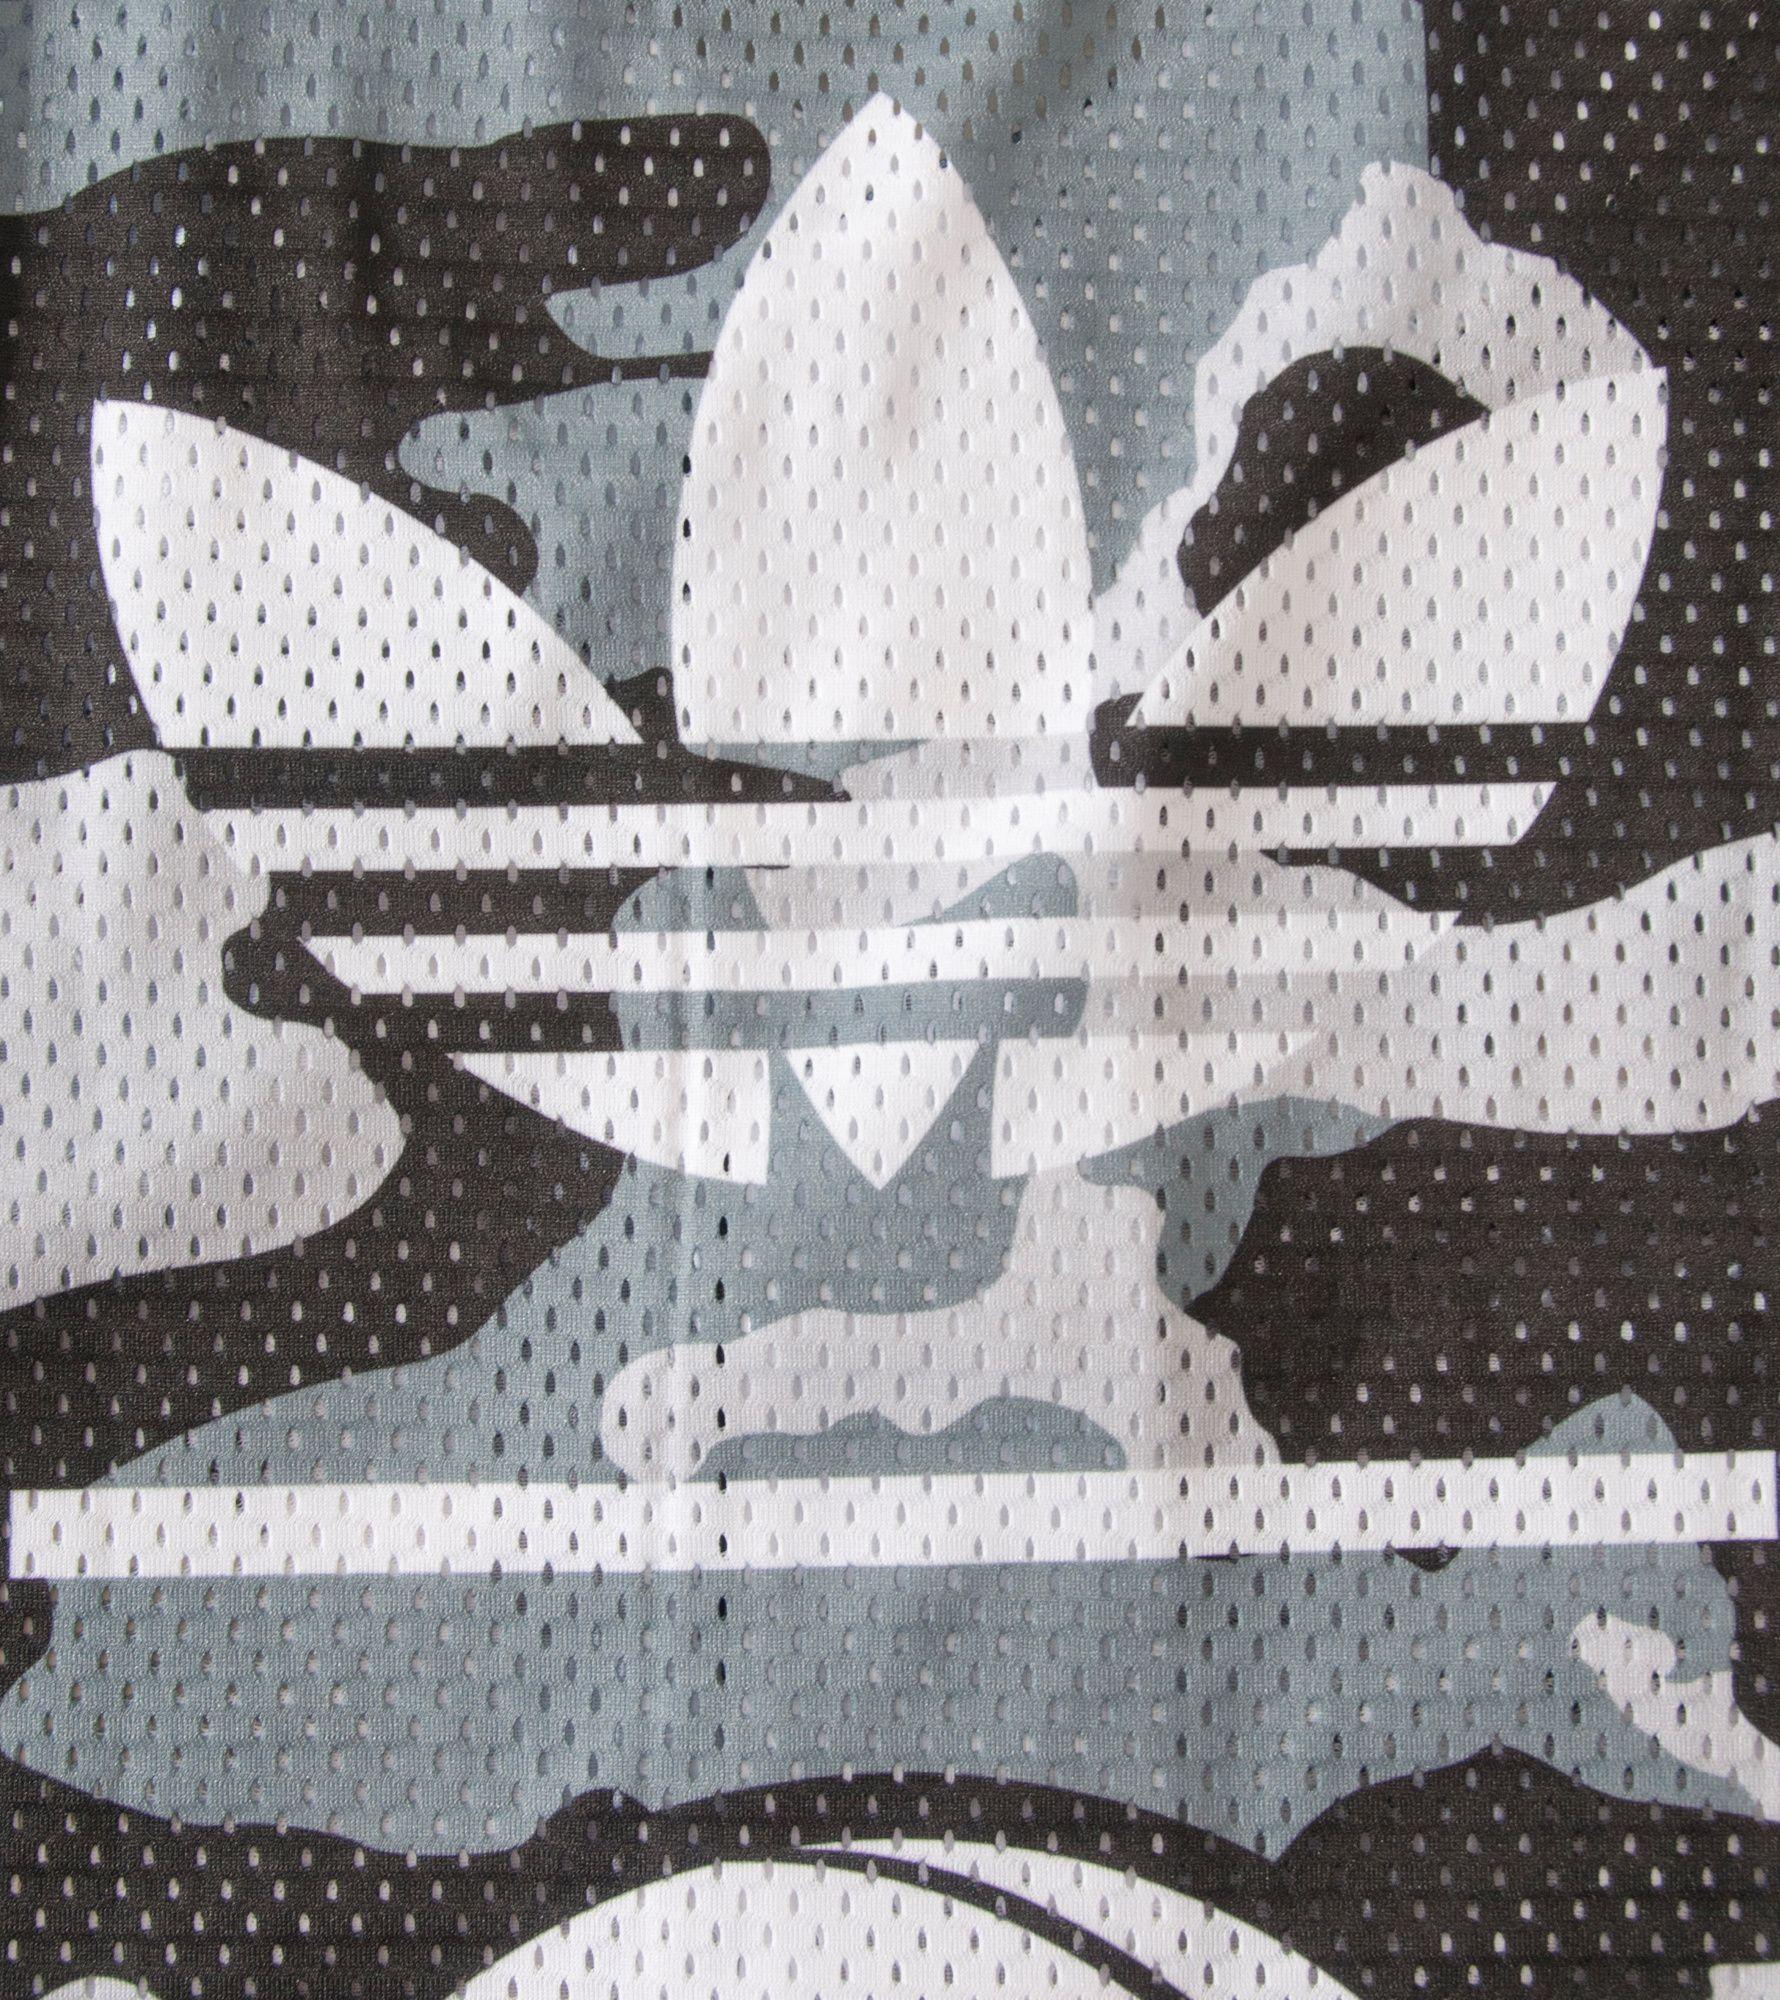 adidas Originals Brooklyn Nets Baseball Shirt